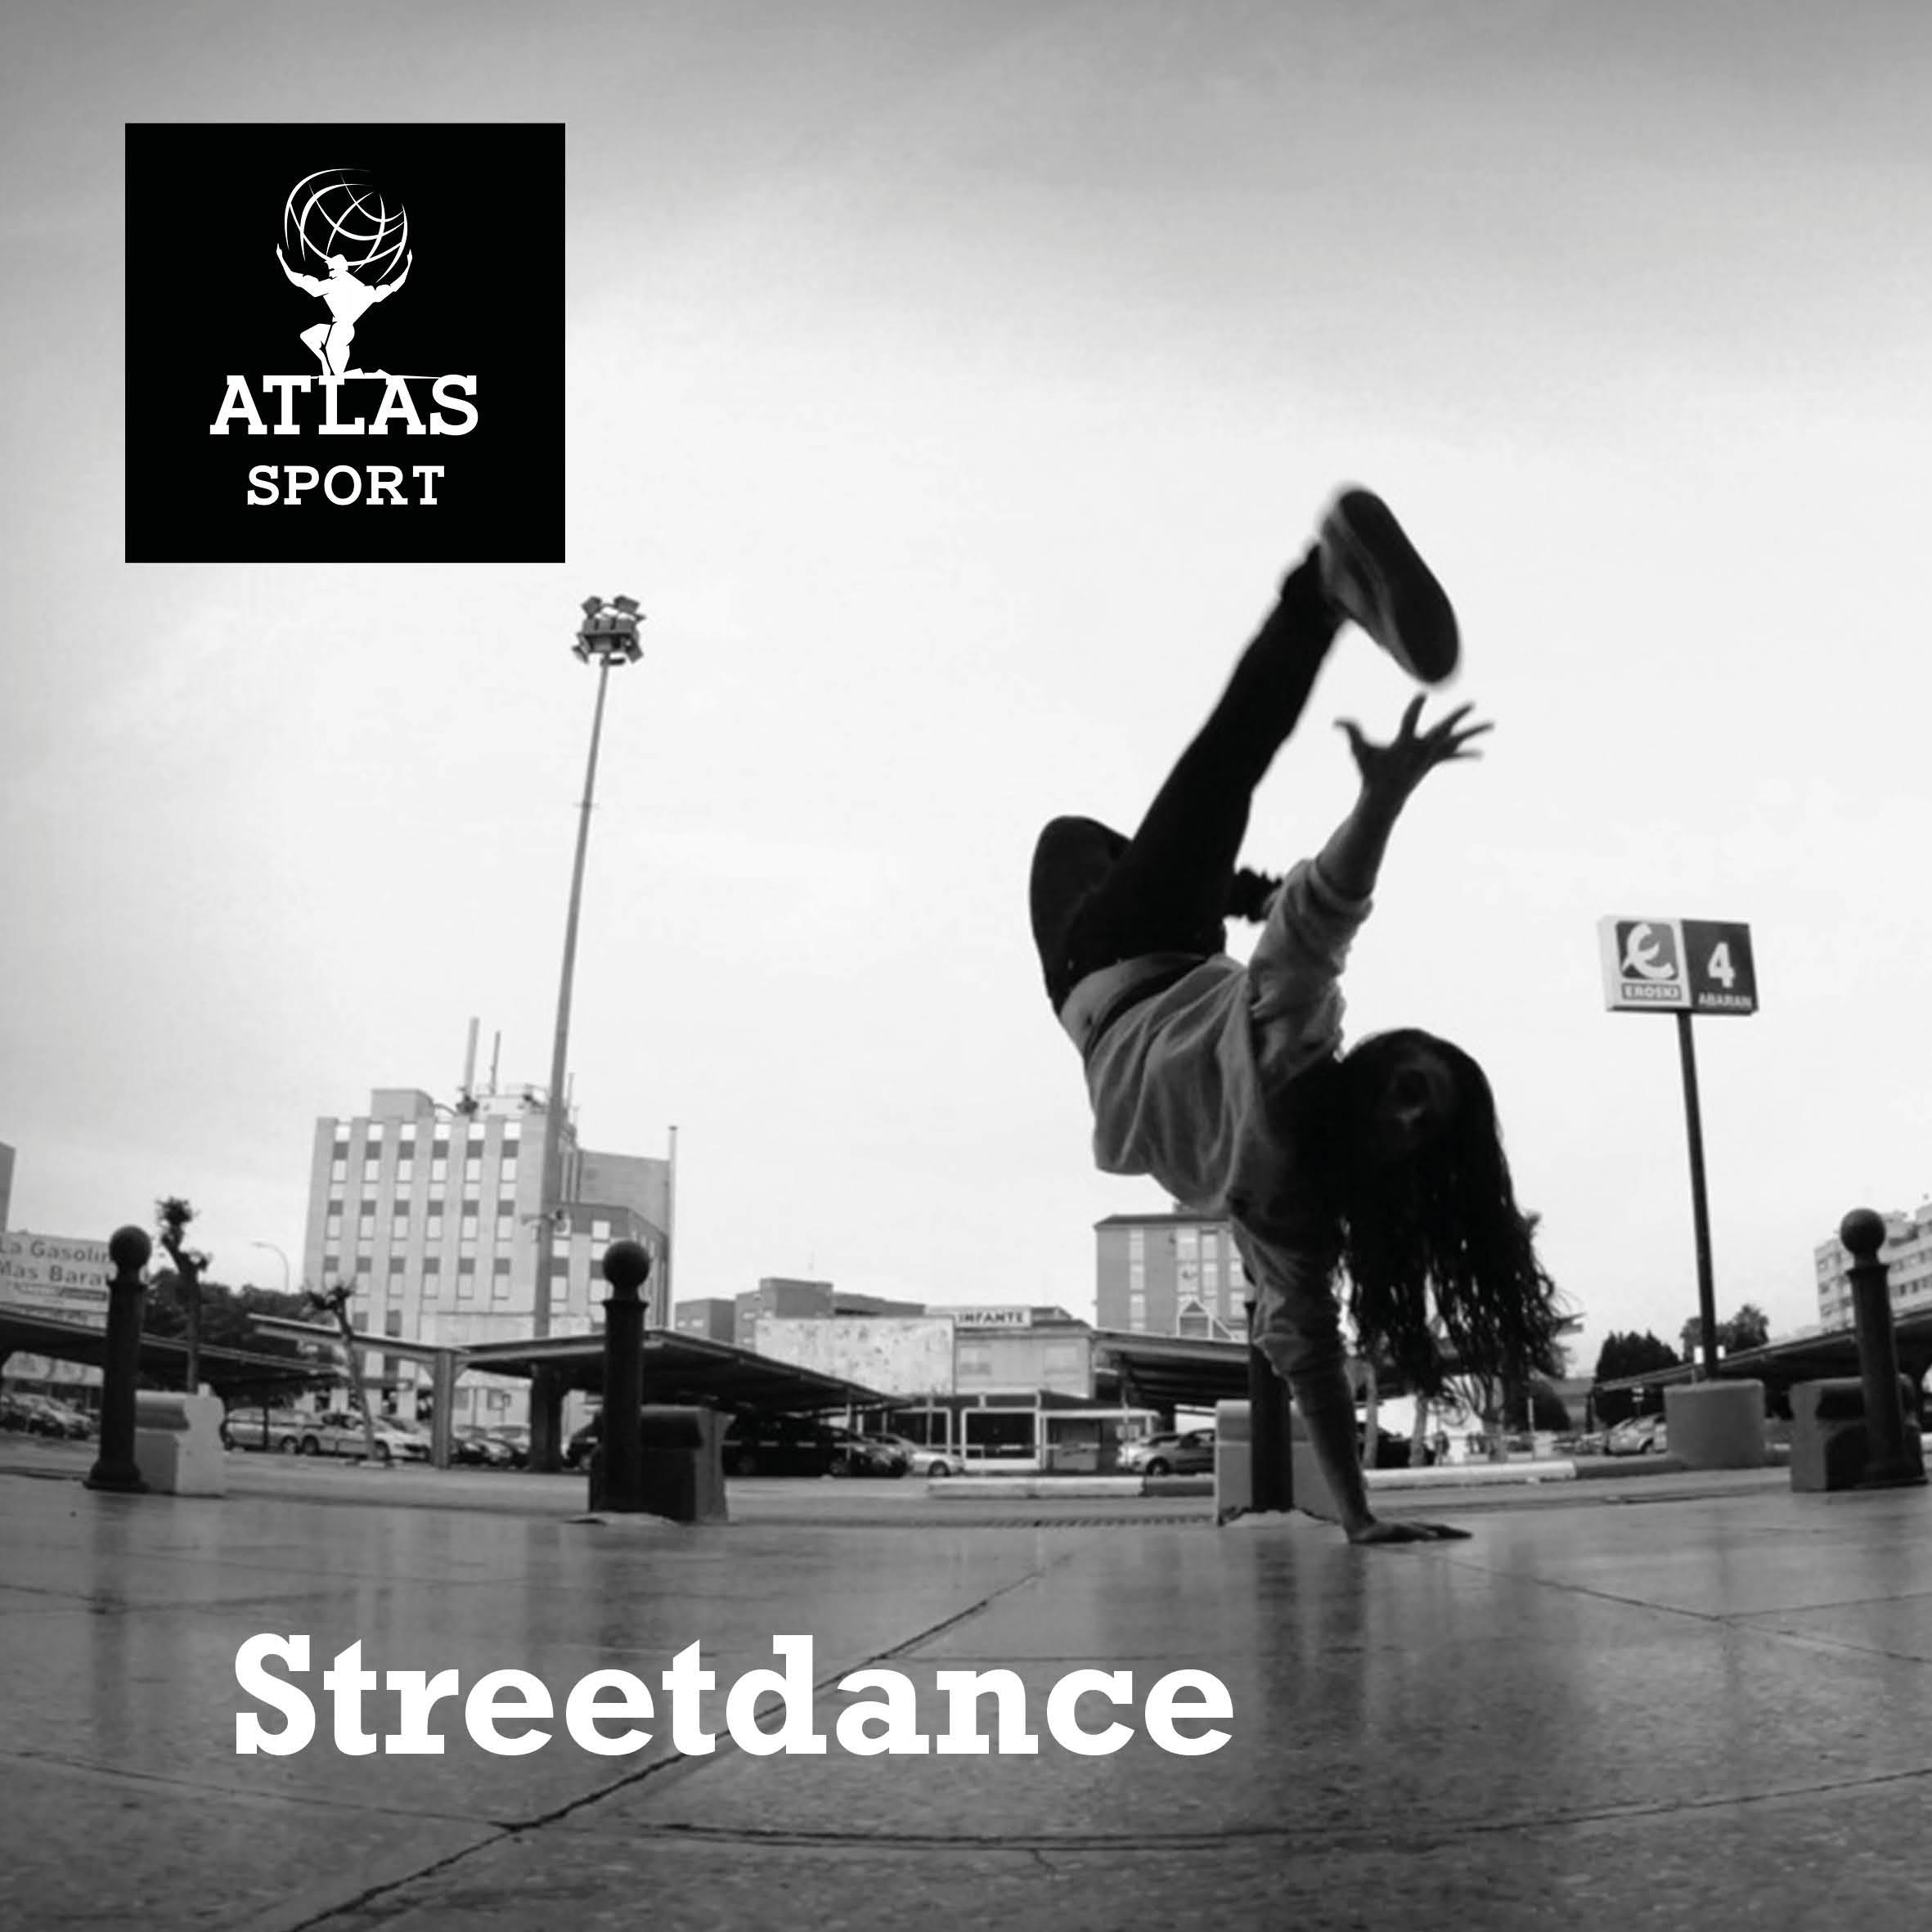 Streetdance (1)